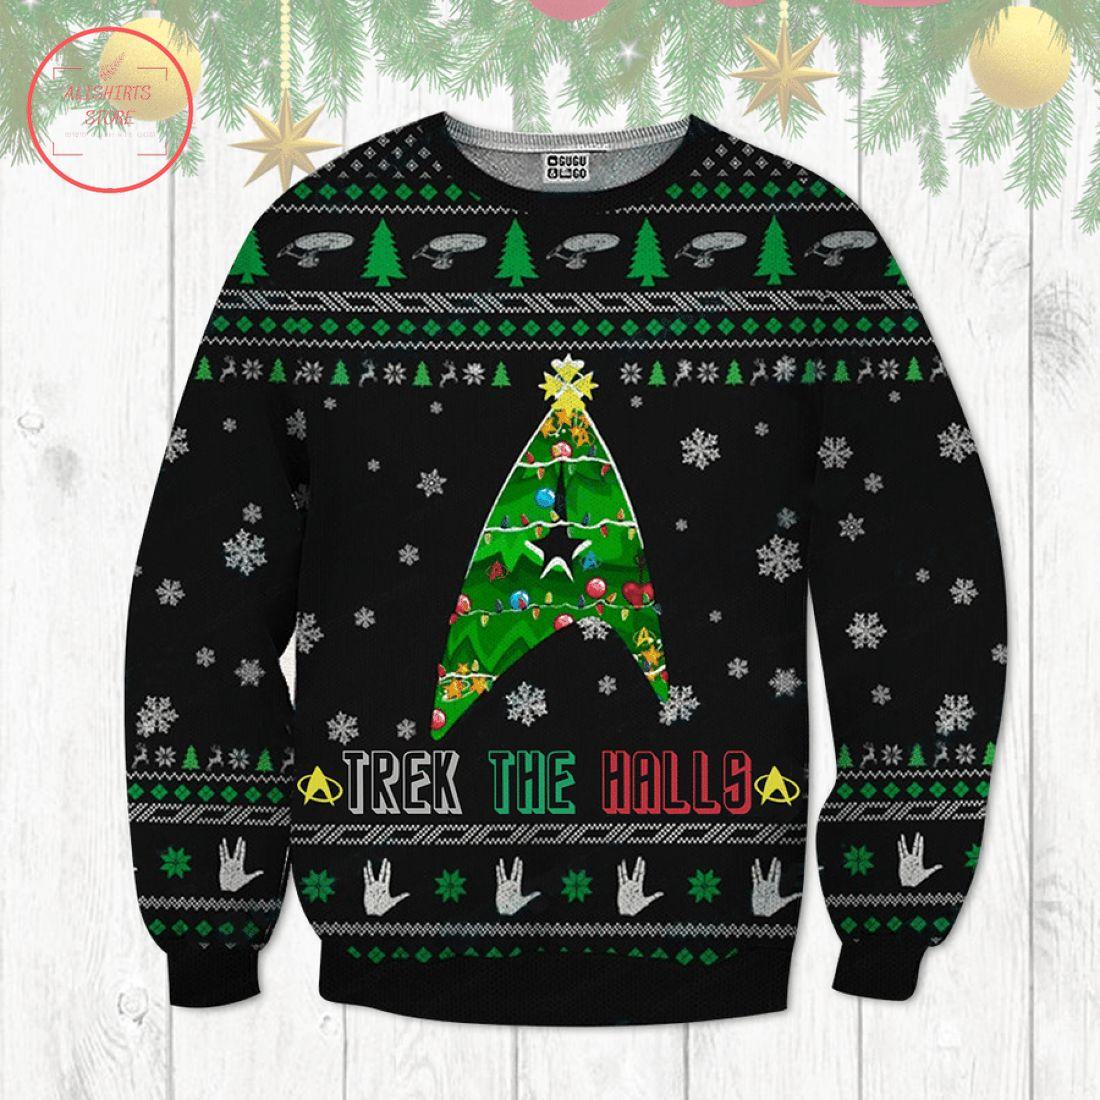 Trek The Halls Ugly Christmas Sweater